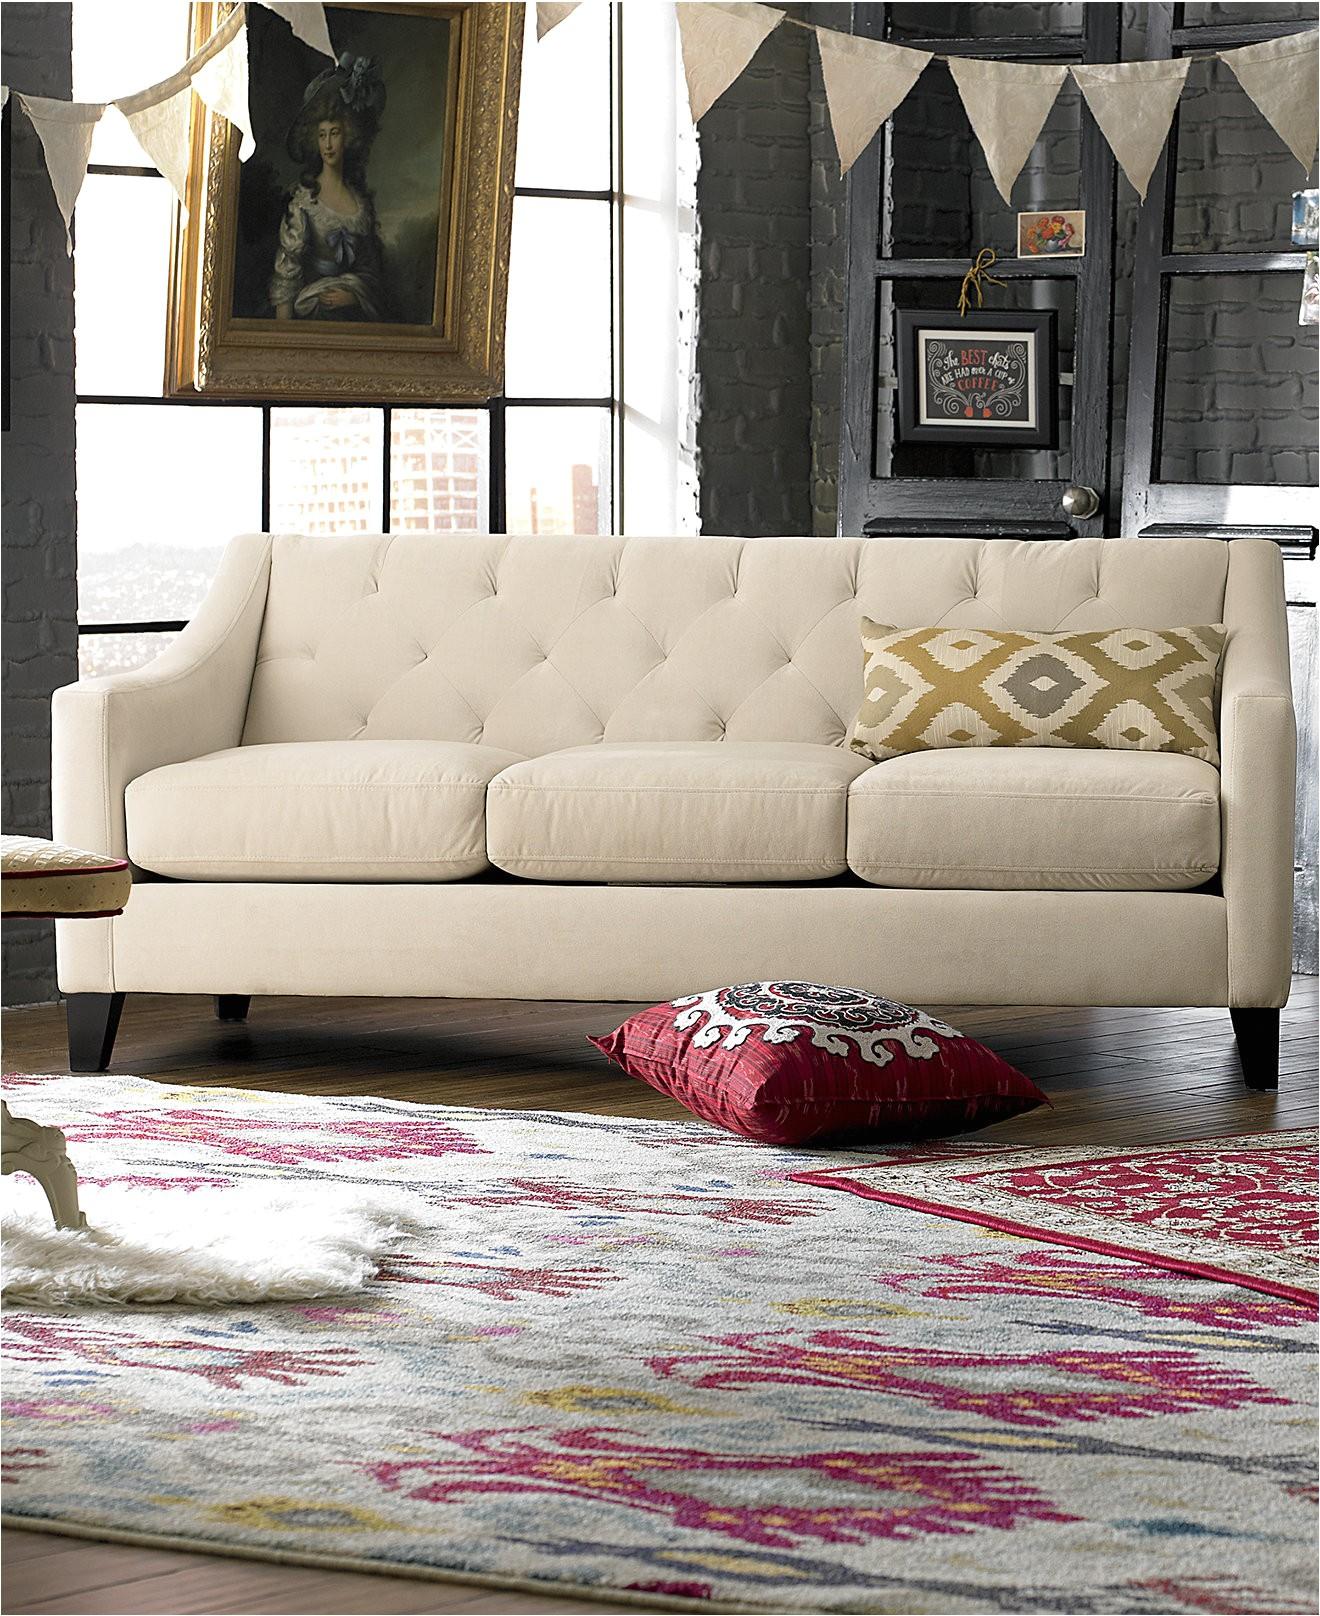 Macys Furniture Chloe sofa Exceptional Macys Living Room Chairs with Chloe Velvet Tufted sofa